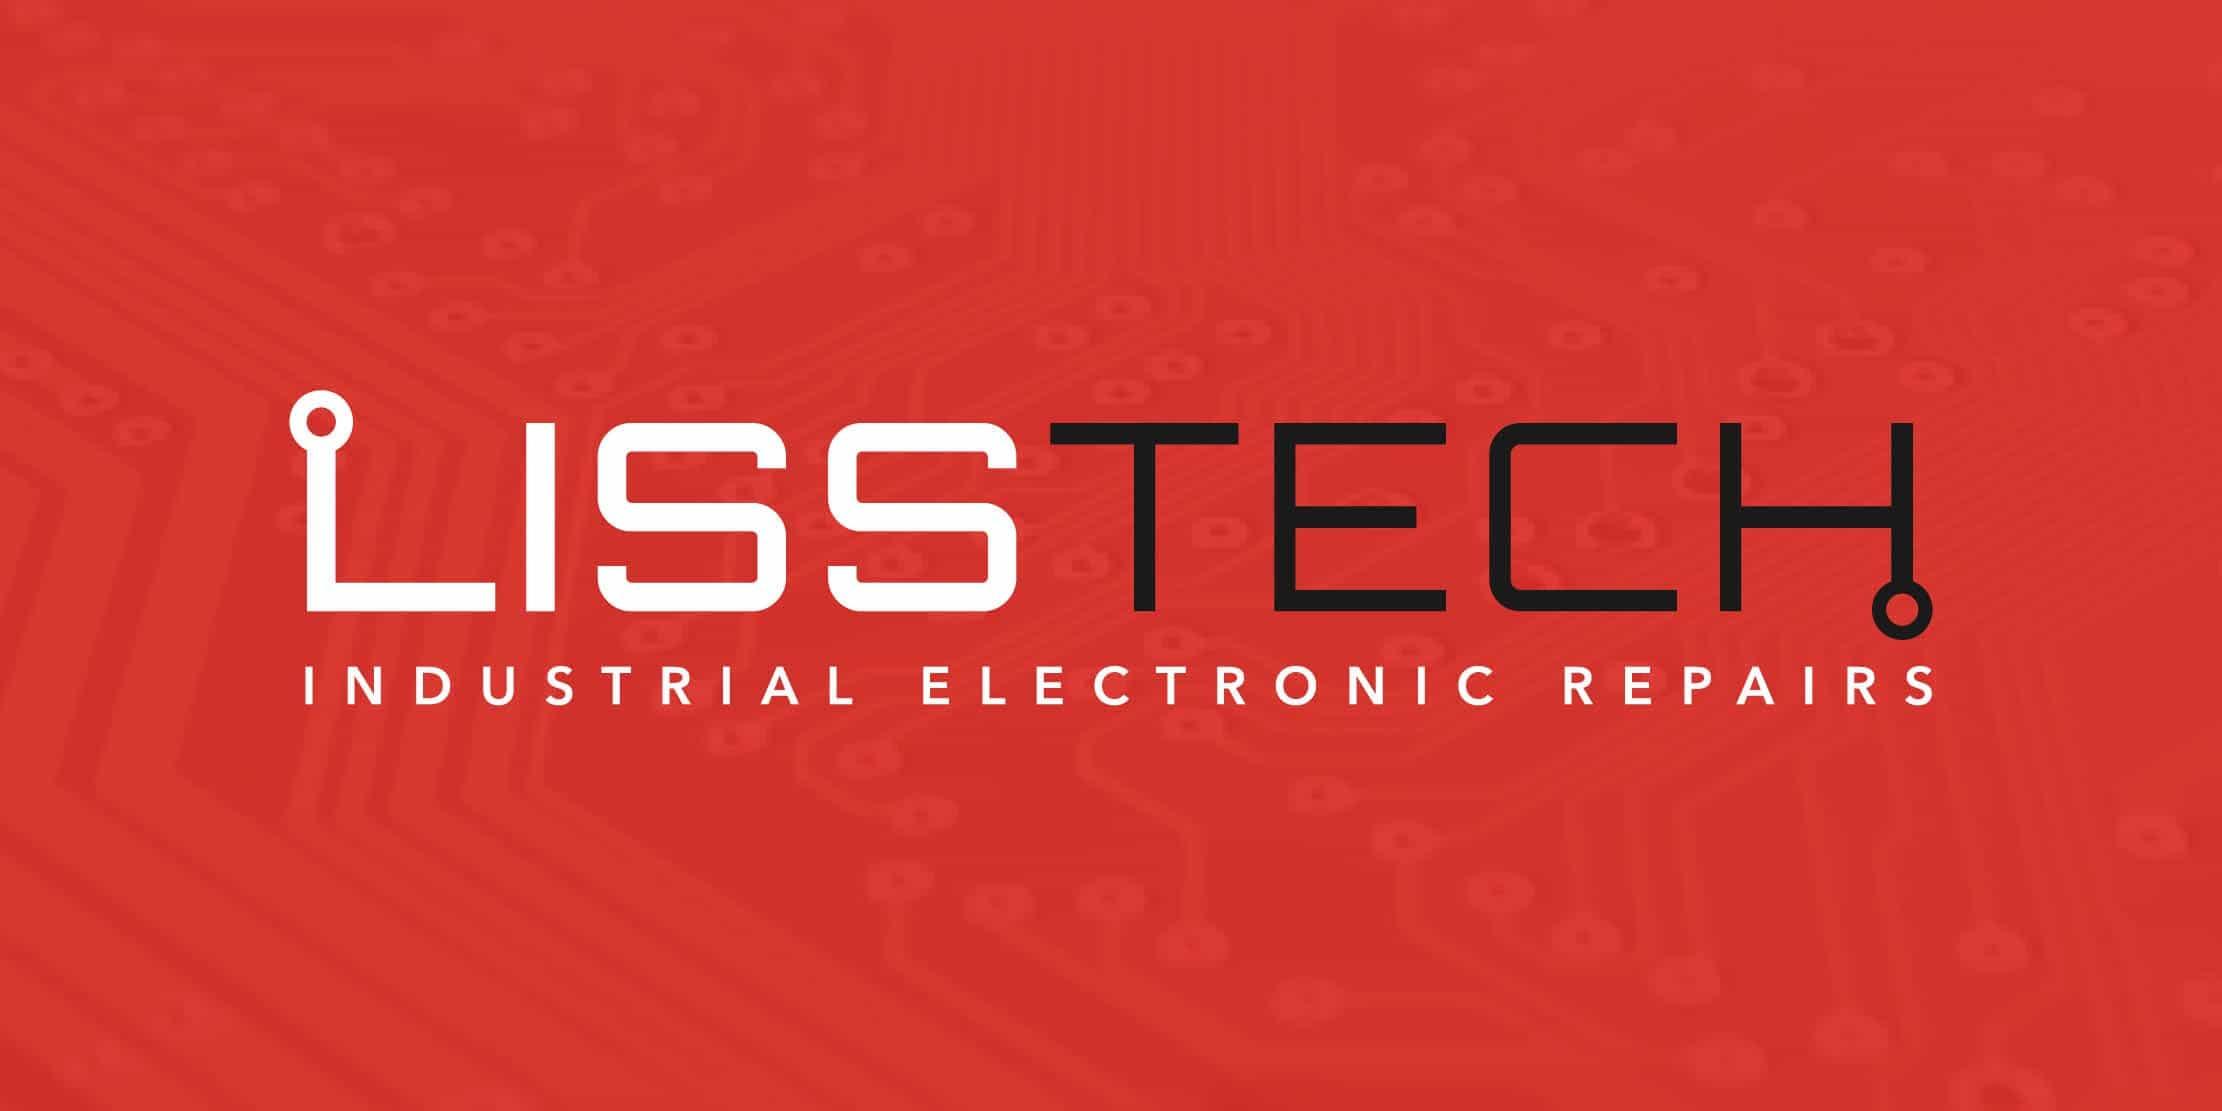 electronic repair logo design red